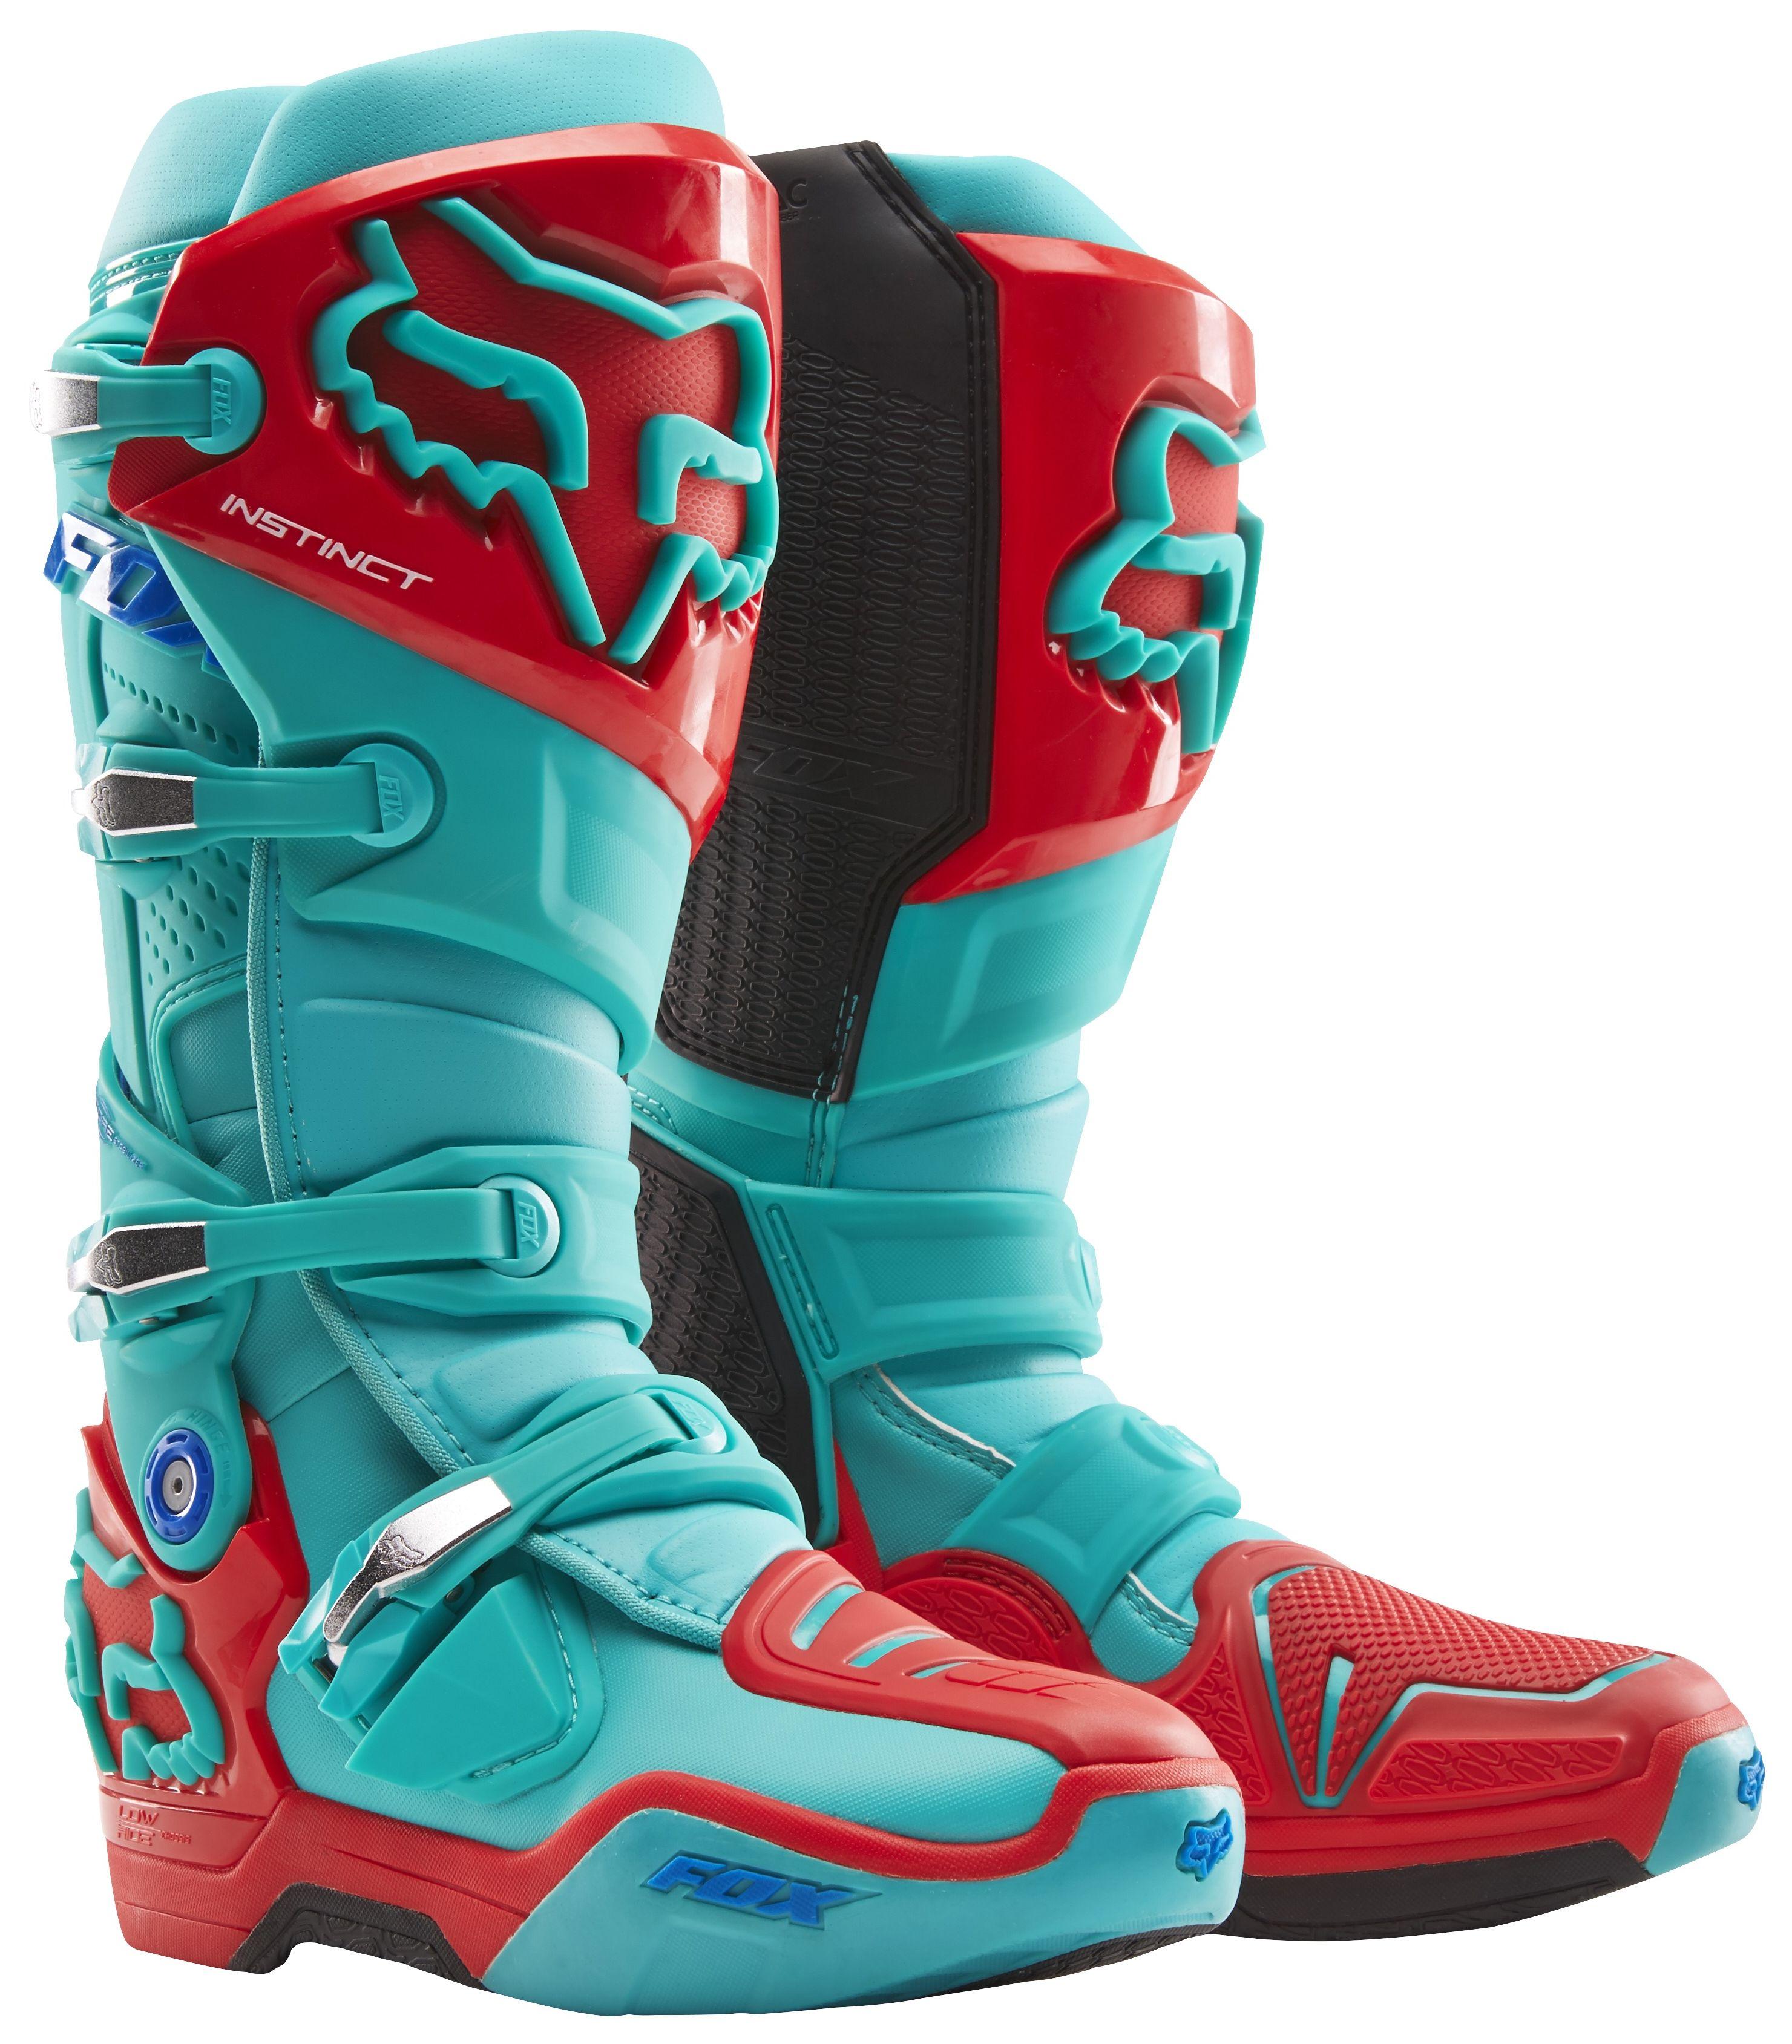 Fox Racing Instinct Union Le Boots Revzilla